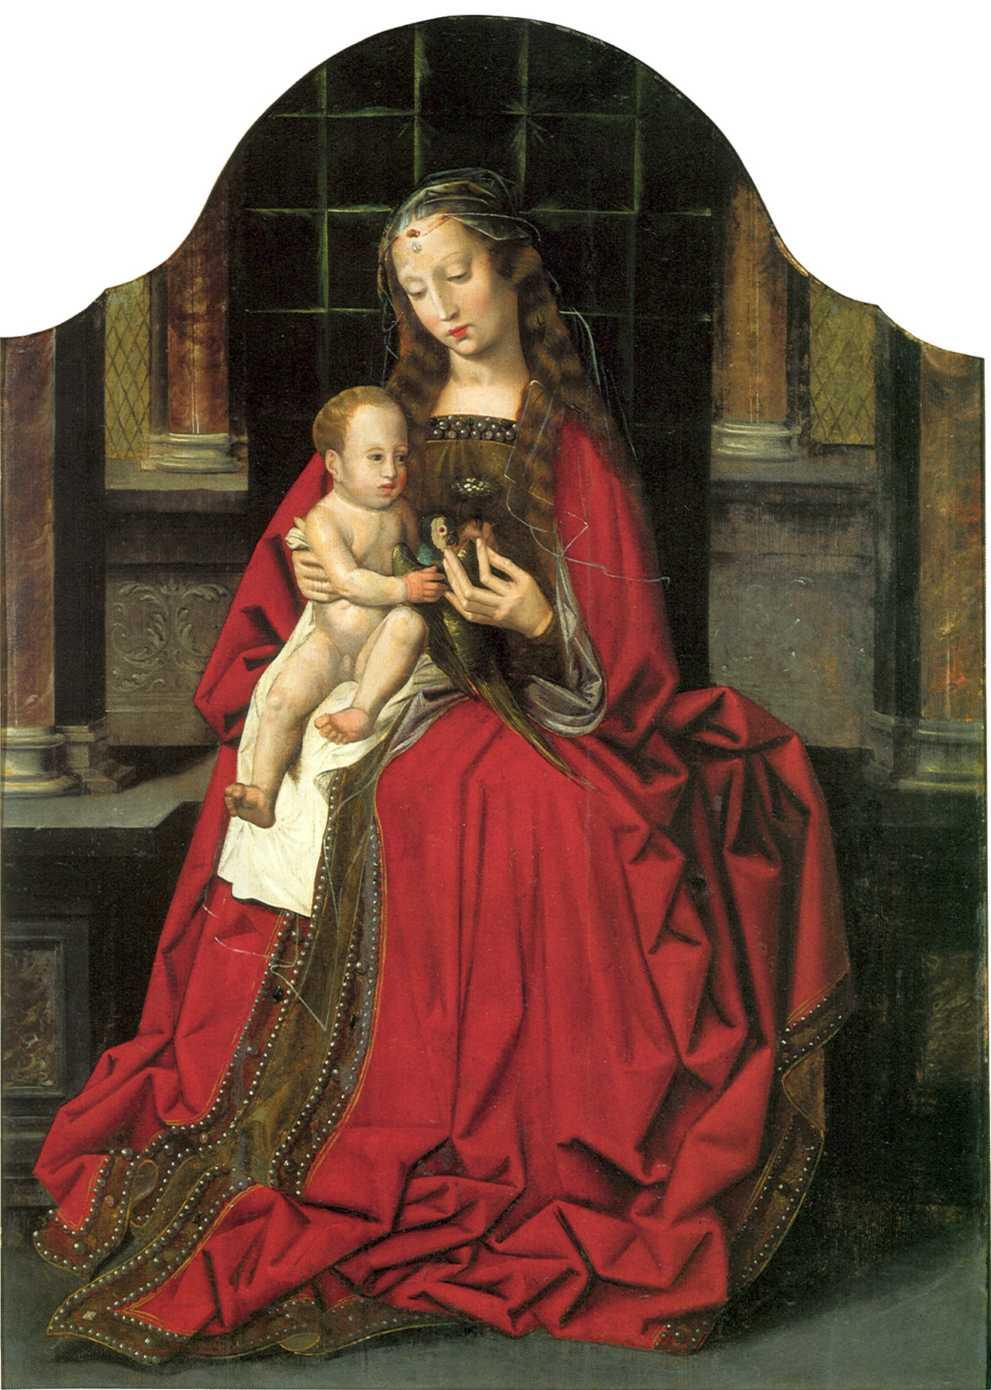 https://upload.wikimedia.org/wikipedia/commons/0/02/Benson_Ambrosius-Madonna_with_Child.jpg